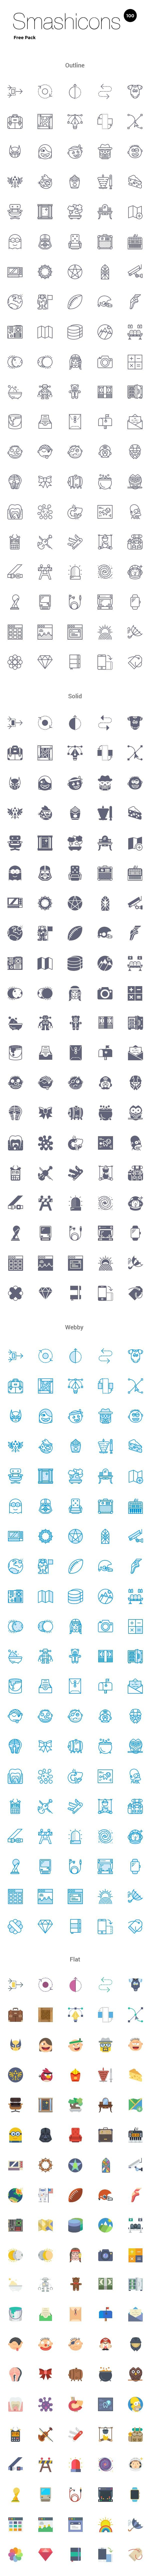 Free Download Smashicons 100 Free Icons